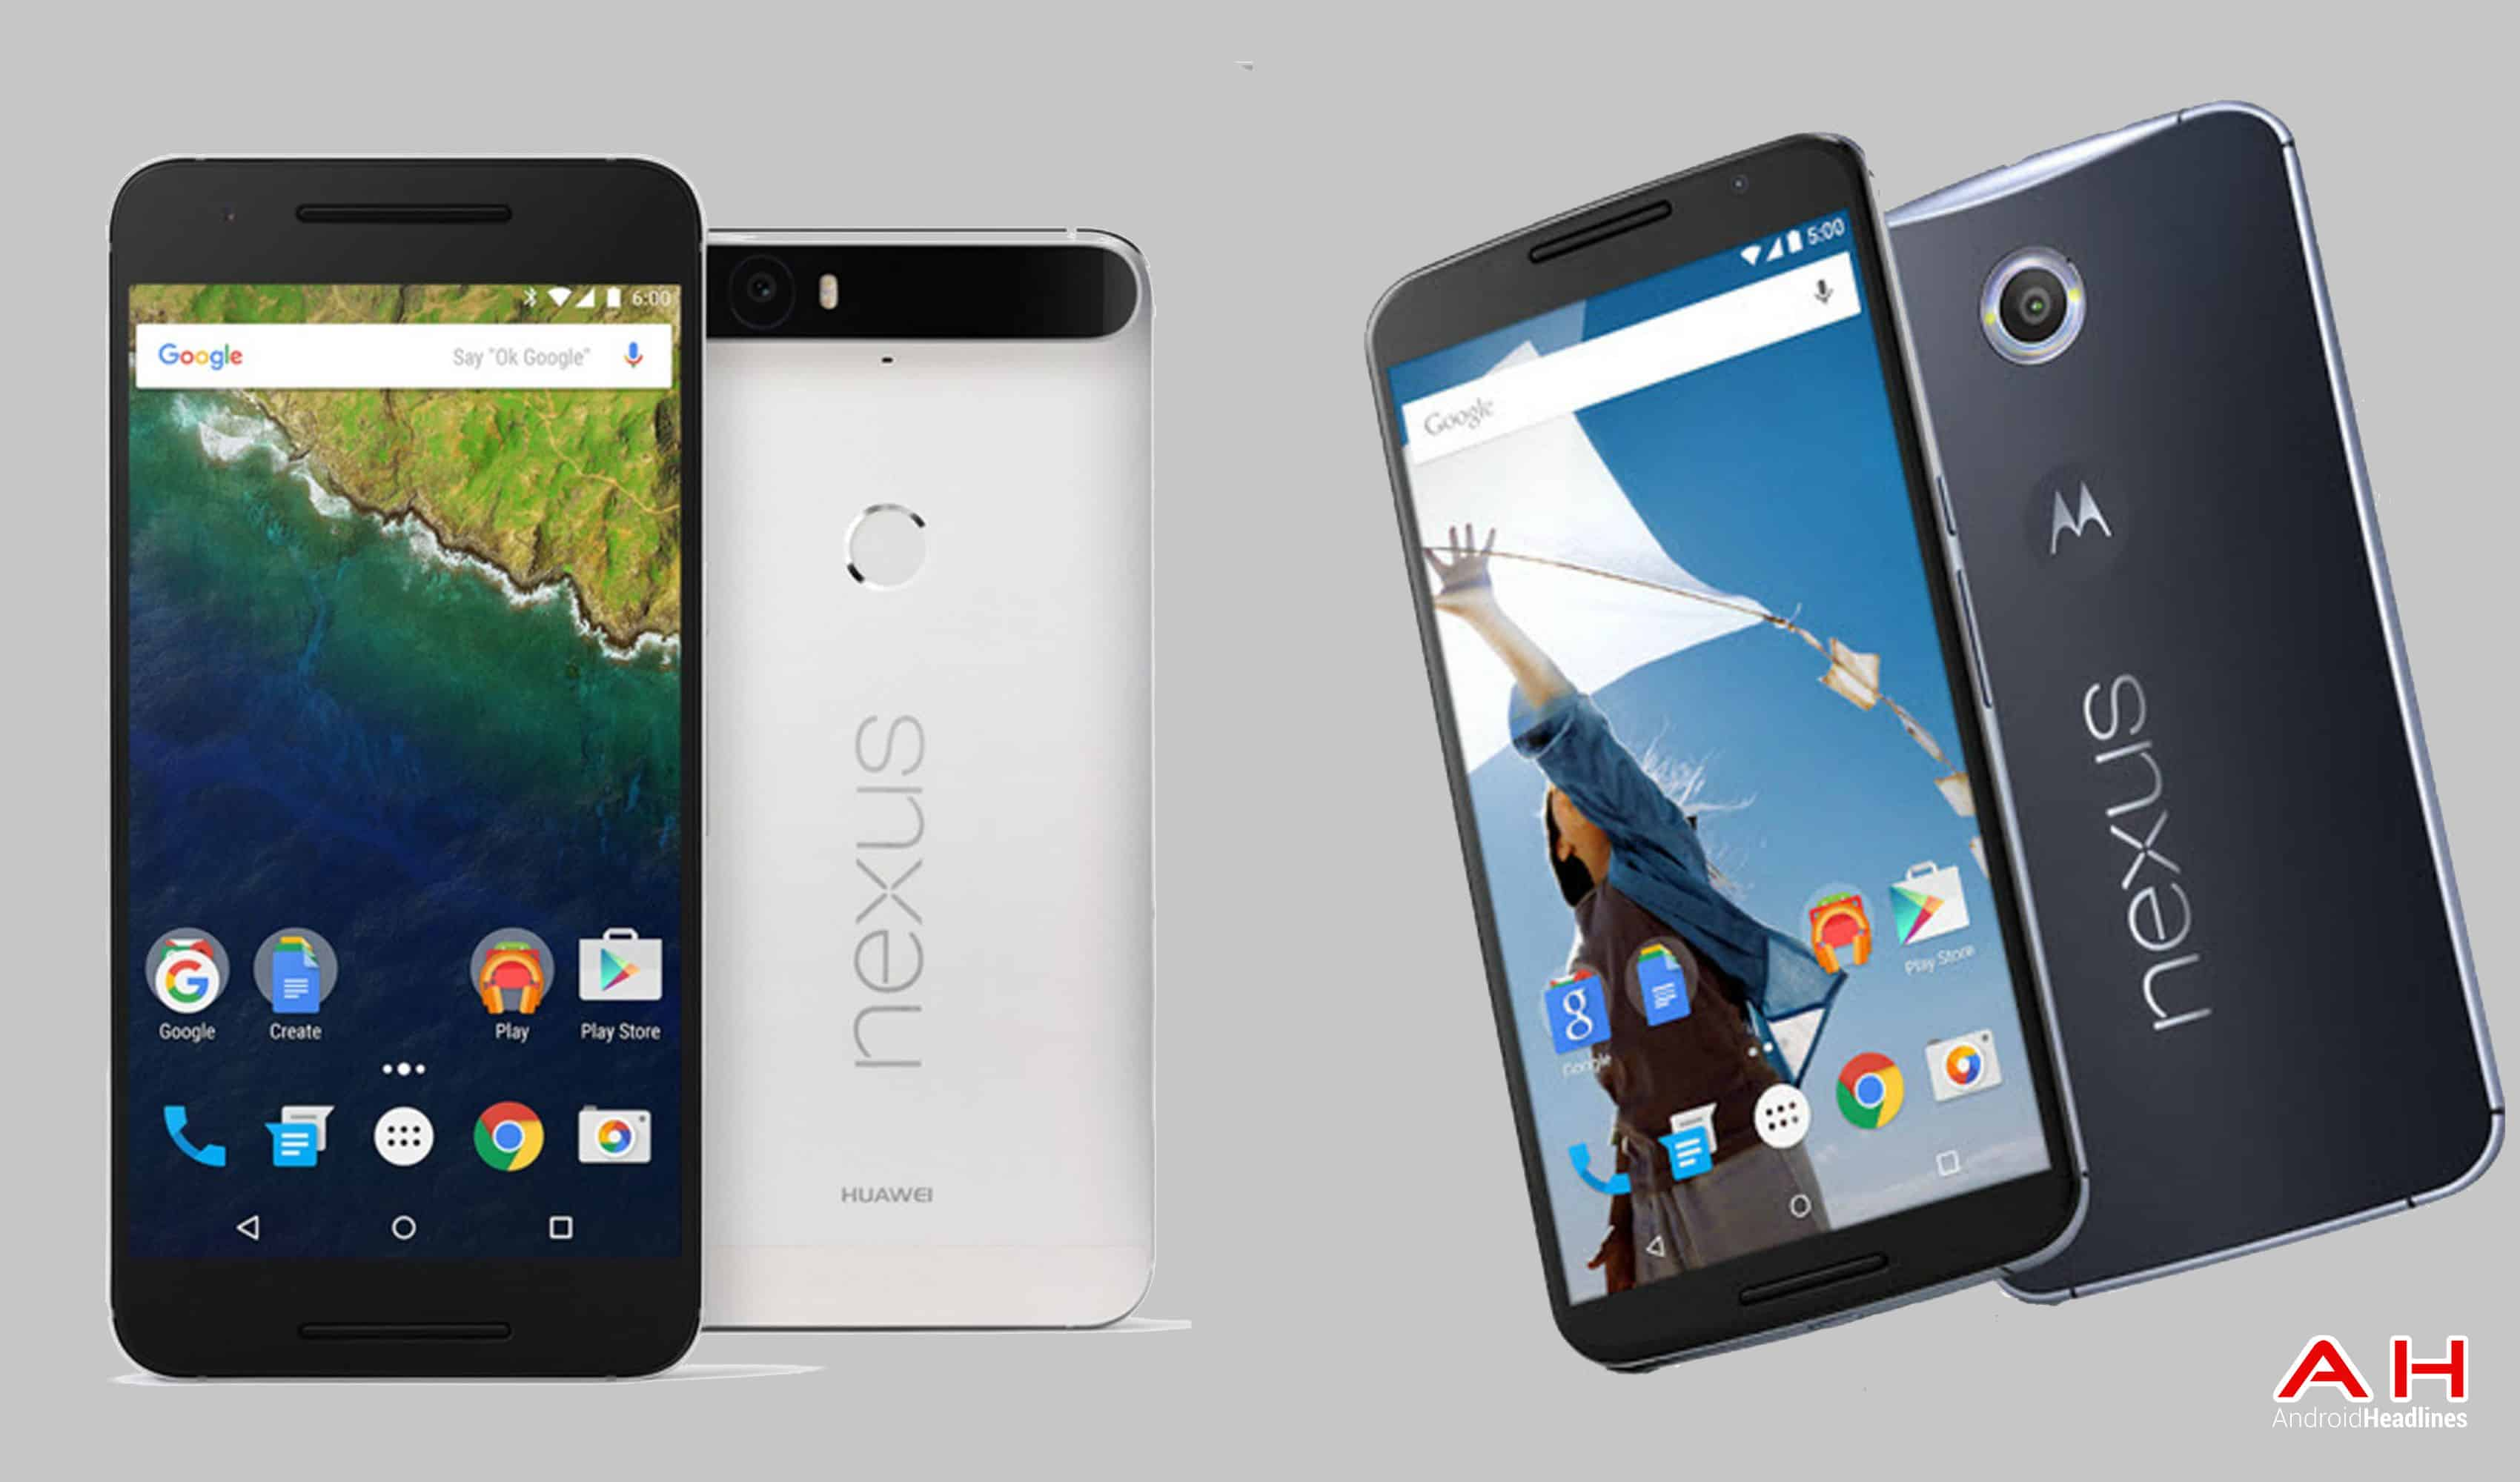 motorola 6. phone comparisons: huawei nexus 6p vs motorola 6 (2014) | androidheadlines.com o